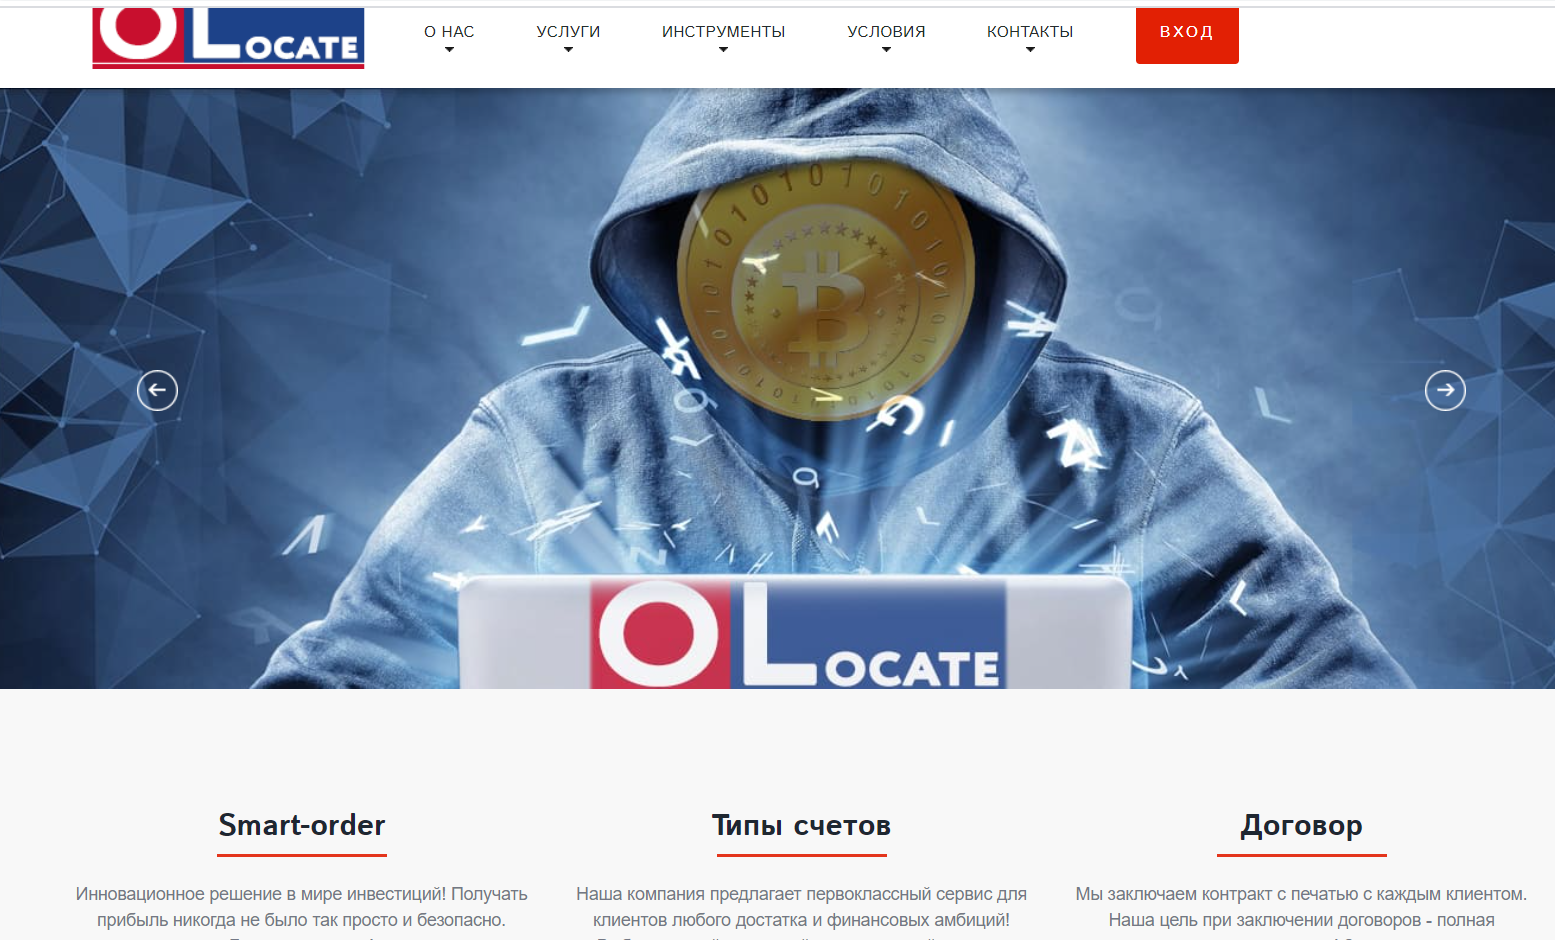 Инвестирование с Olocate